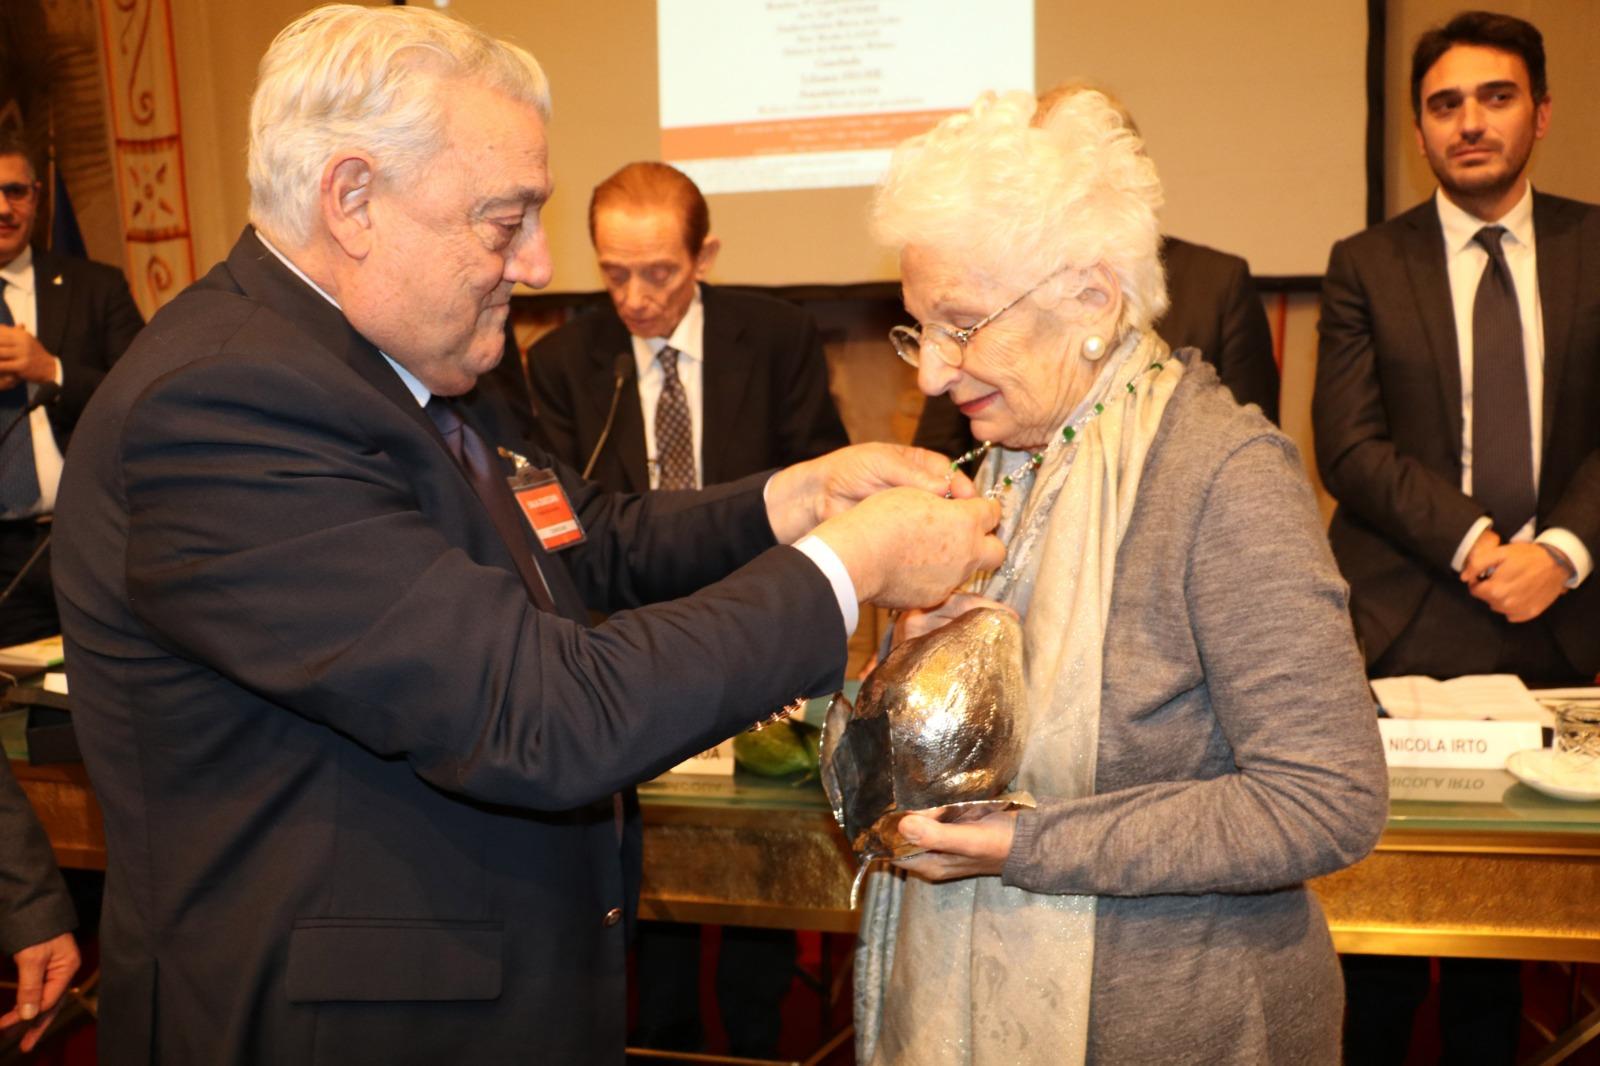 Roma-Senato-Liliana-Segre-Gerardo-Sacco